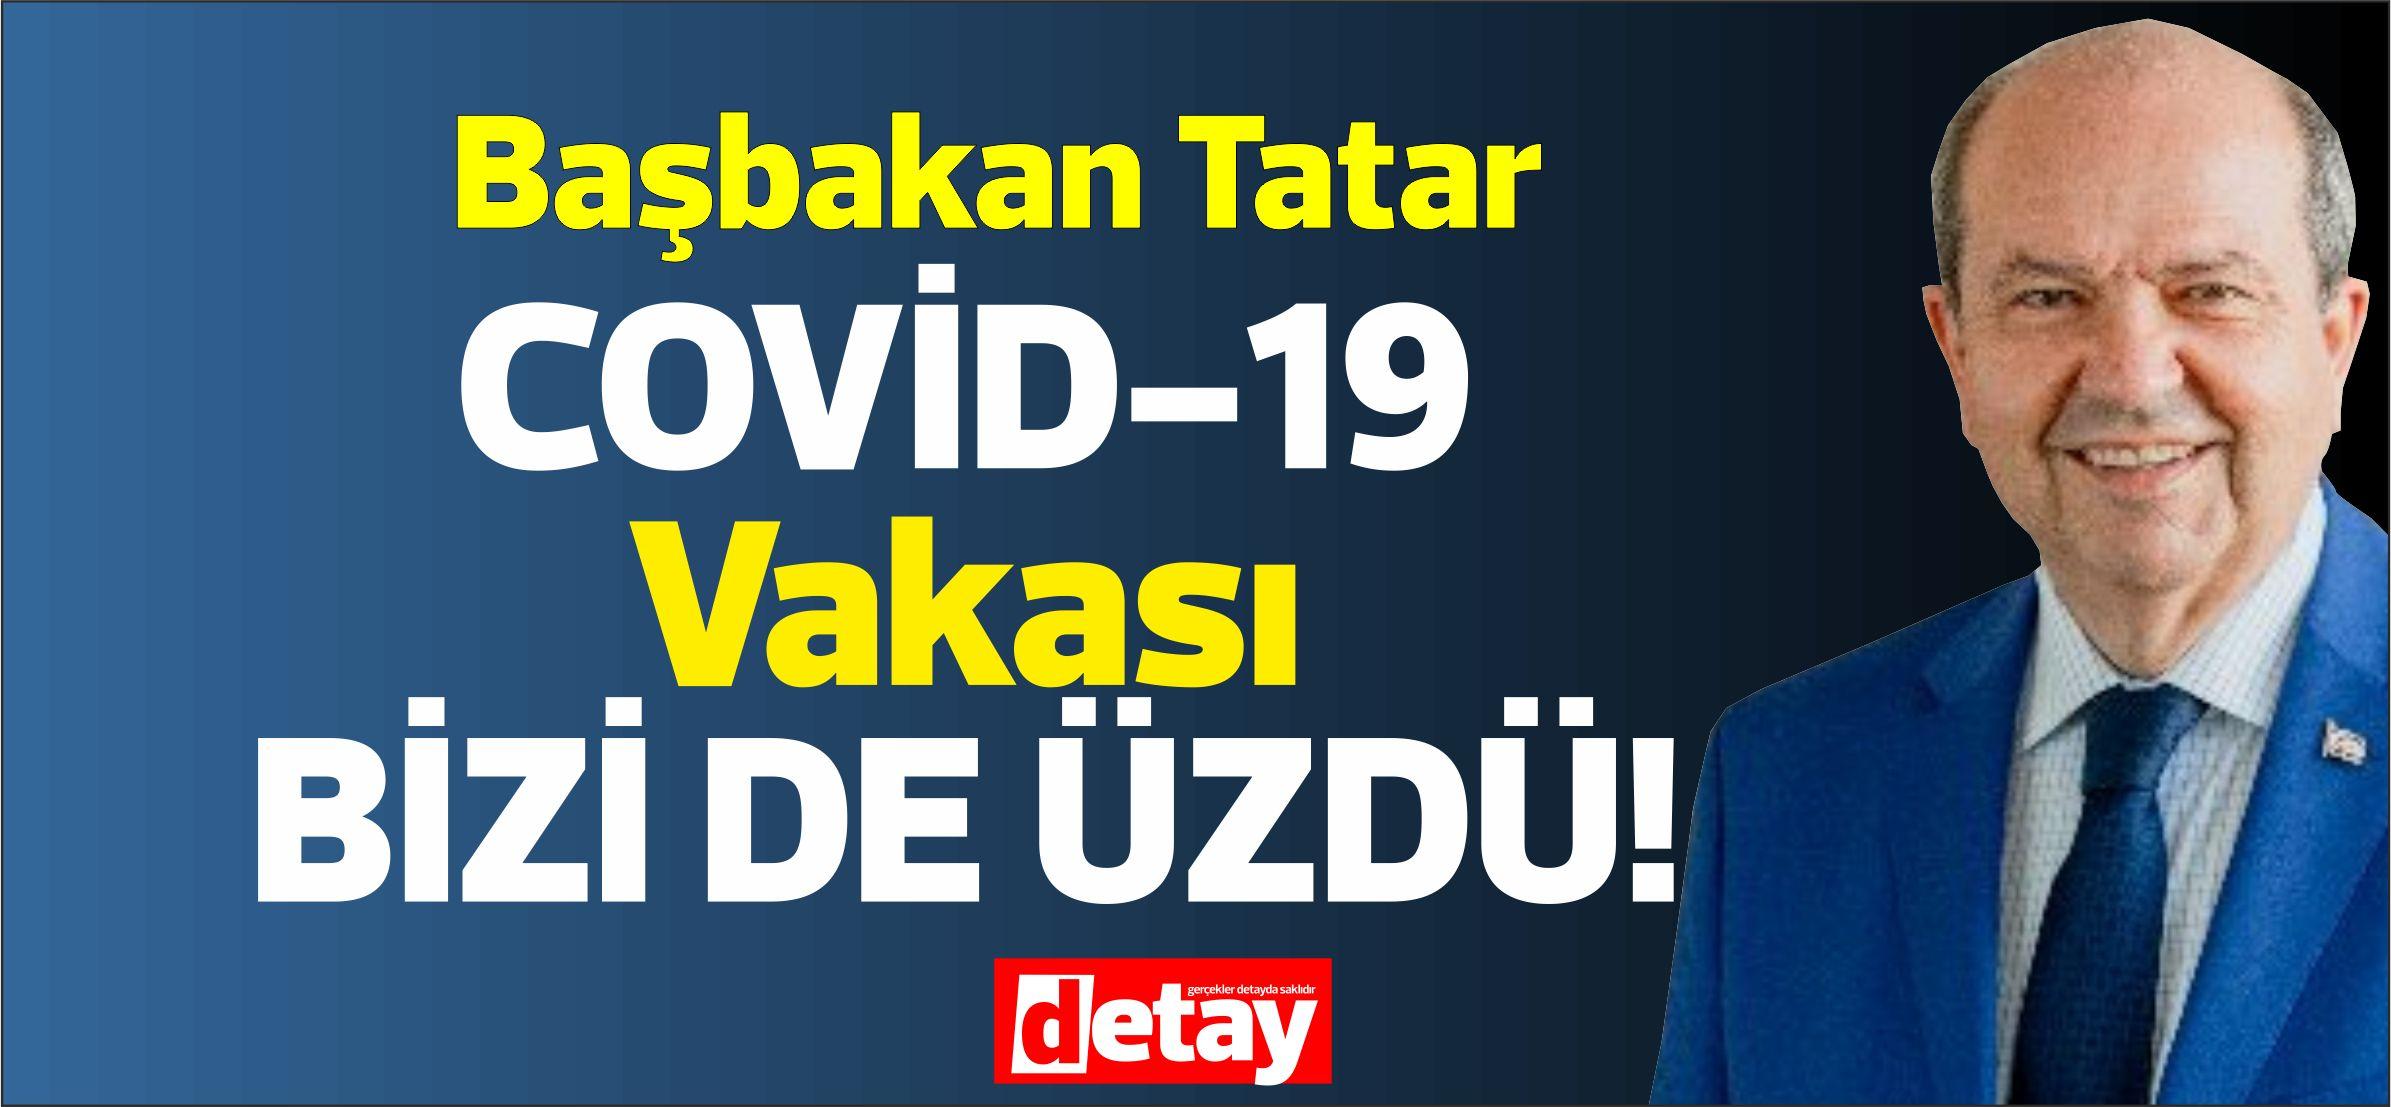 "Başbakan Tatar: ""Bu vaka bizi de üzdü"""